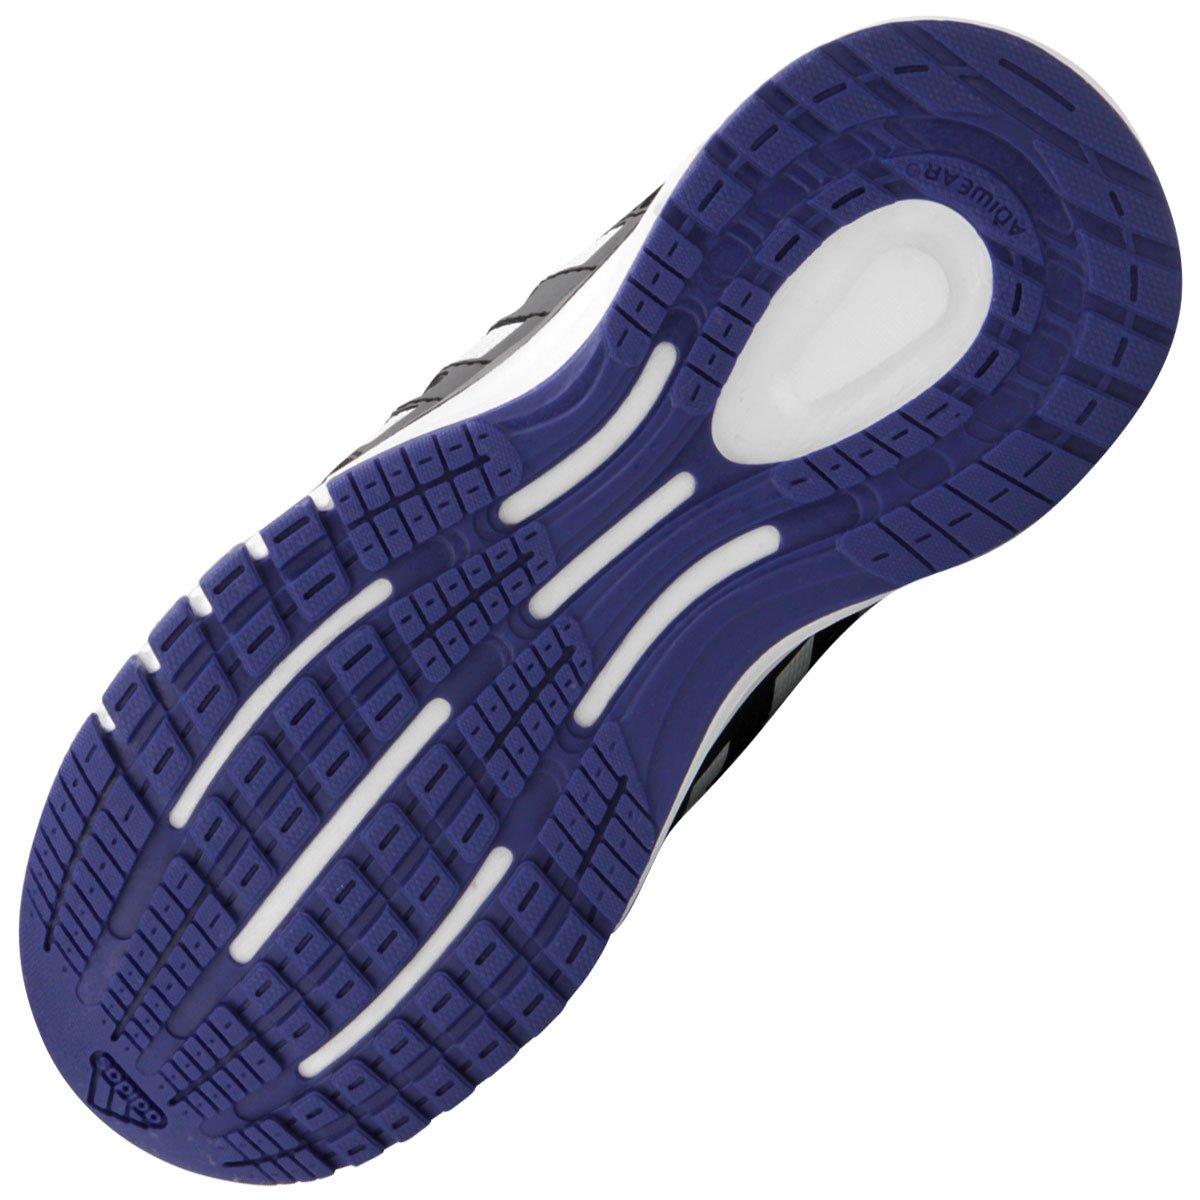 f504a9b15b955 Foto 2 - Tênis Adidas Duramo 6 Print K Infantil